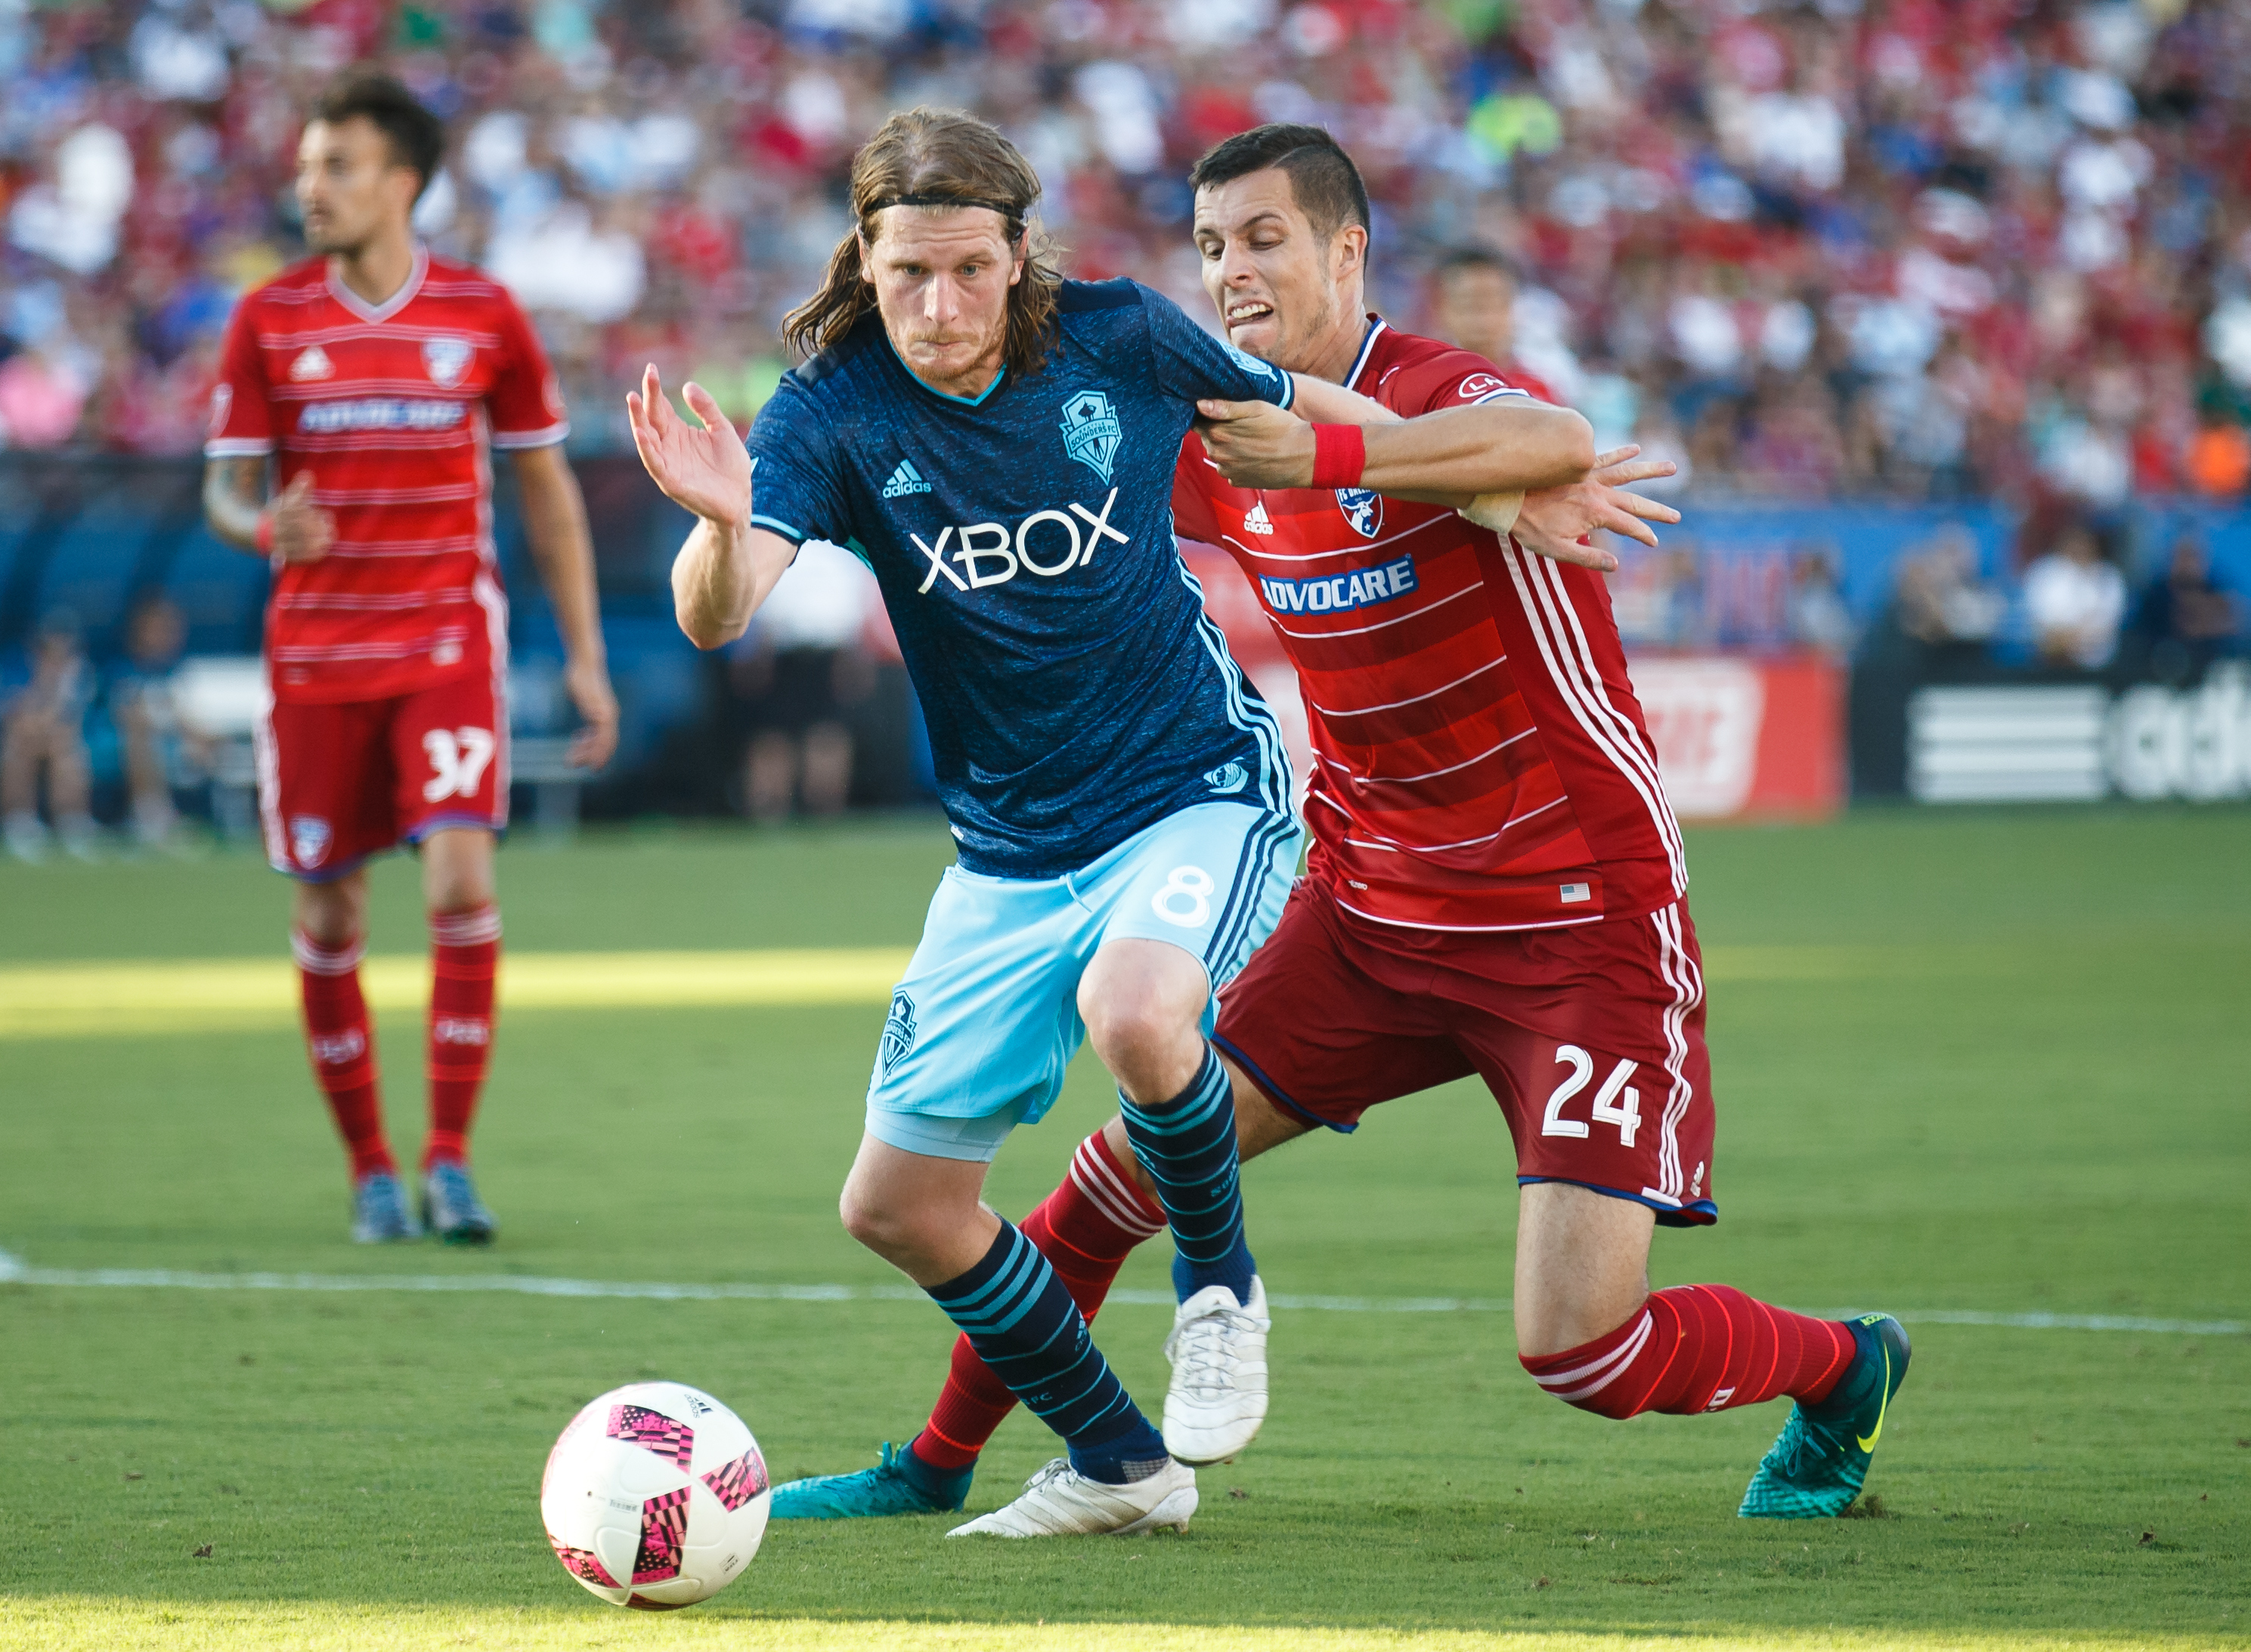 SOCCER: OCT 16 MLS - Sounders at FC Dallas